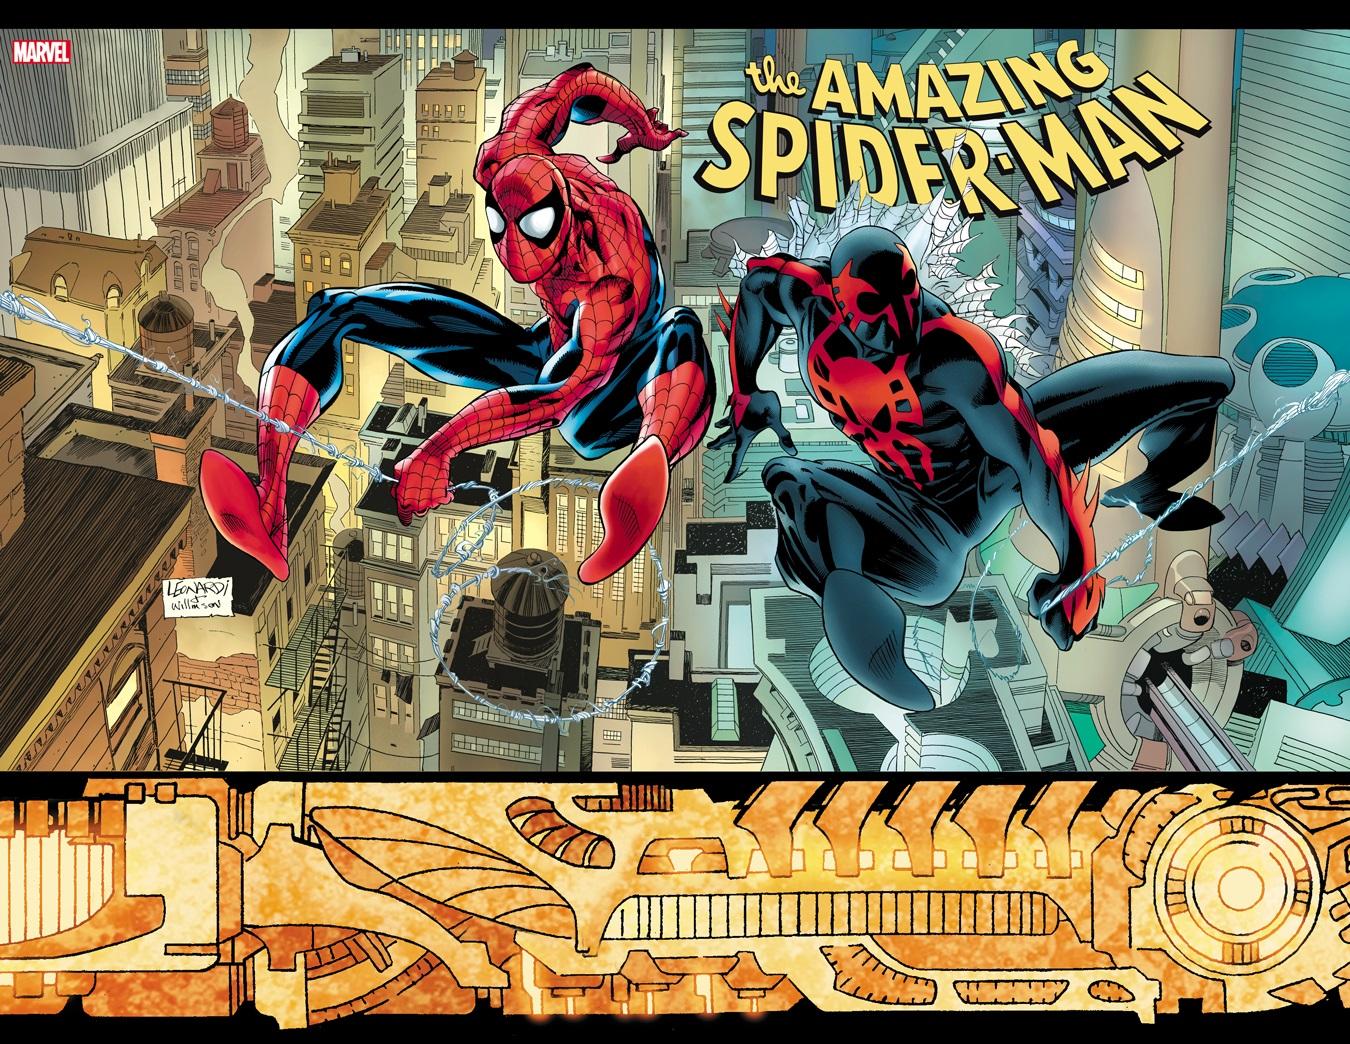 Previews: September 11th, 2019 - Spider Man Crawlspace